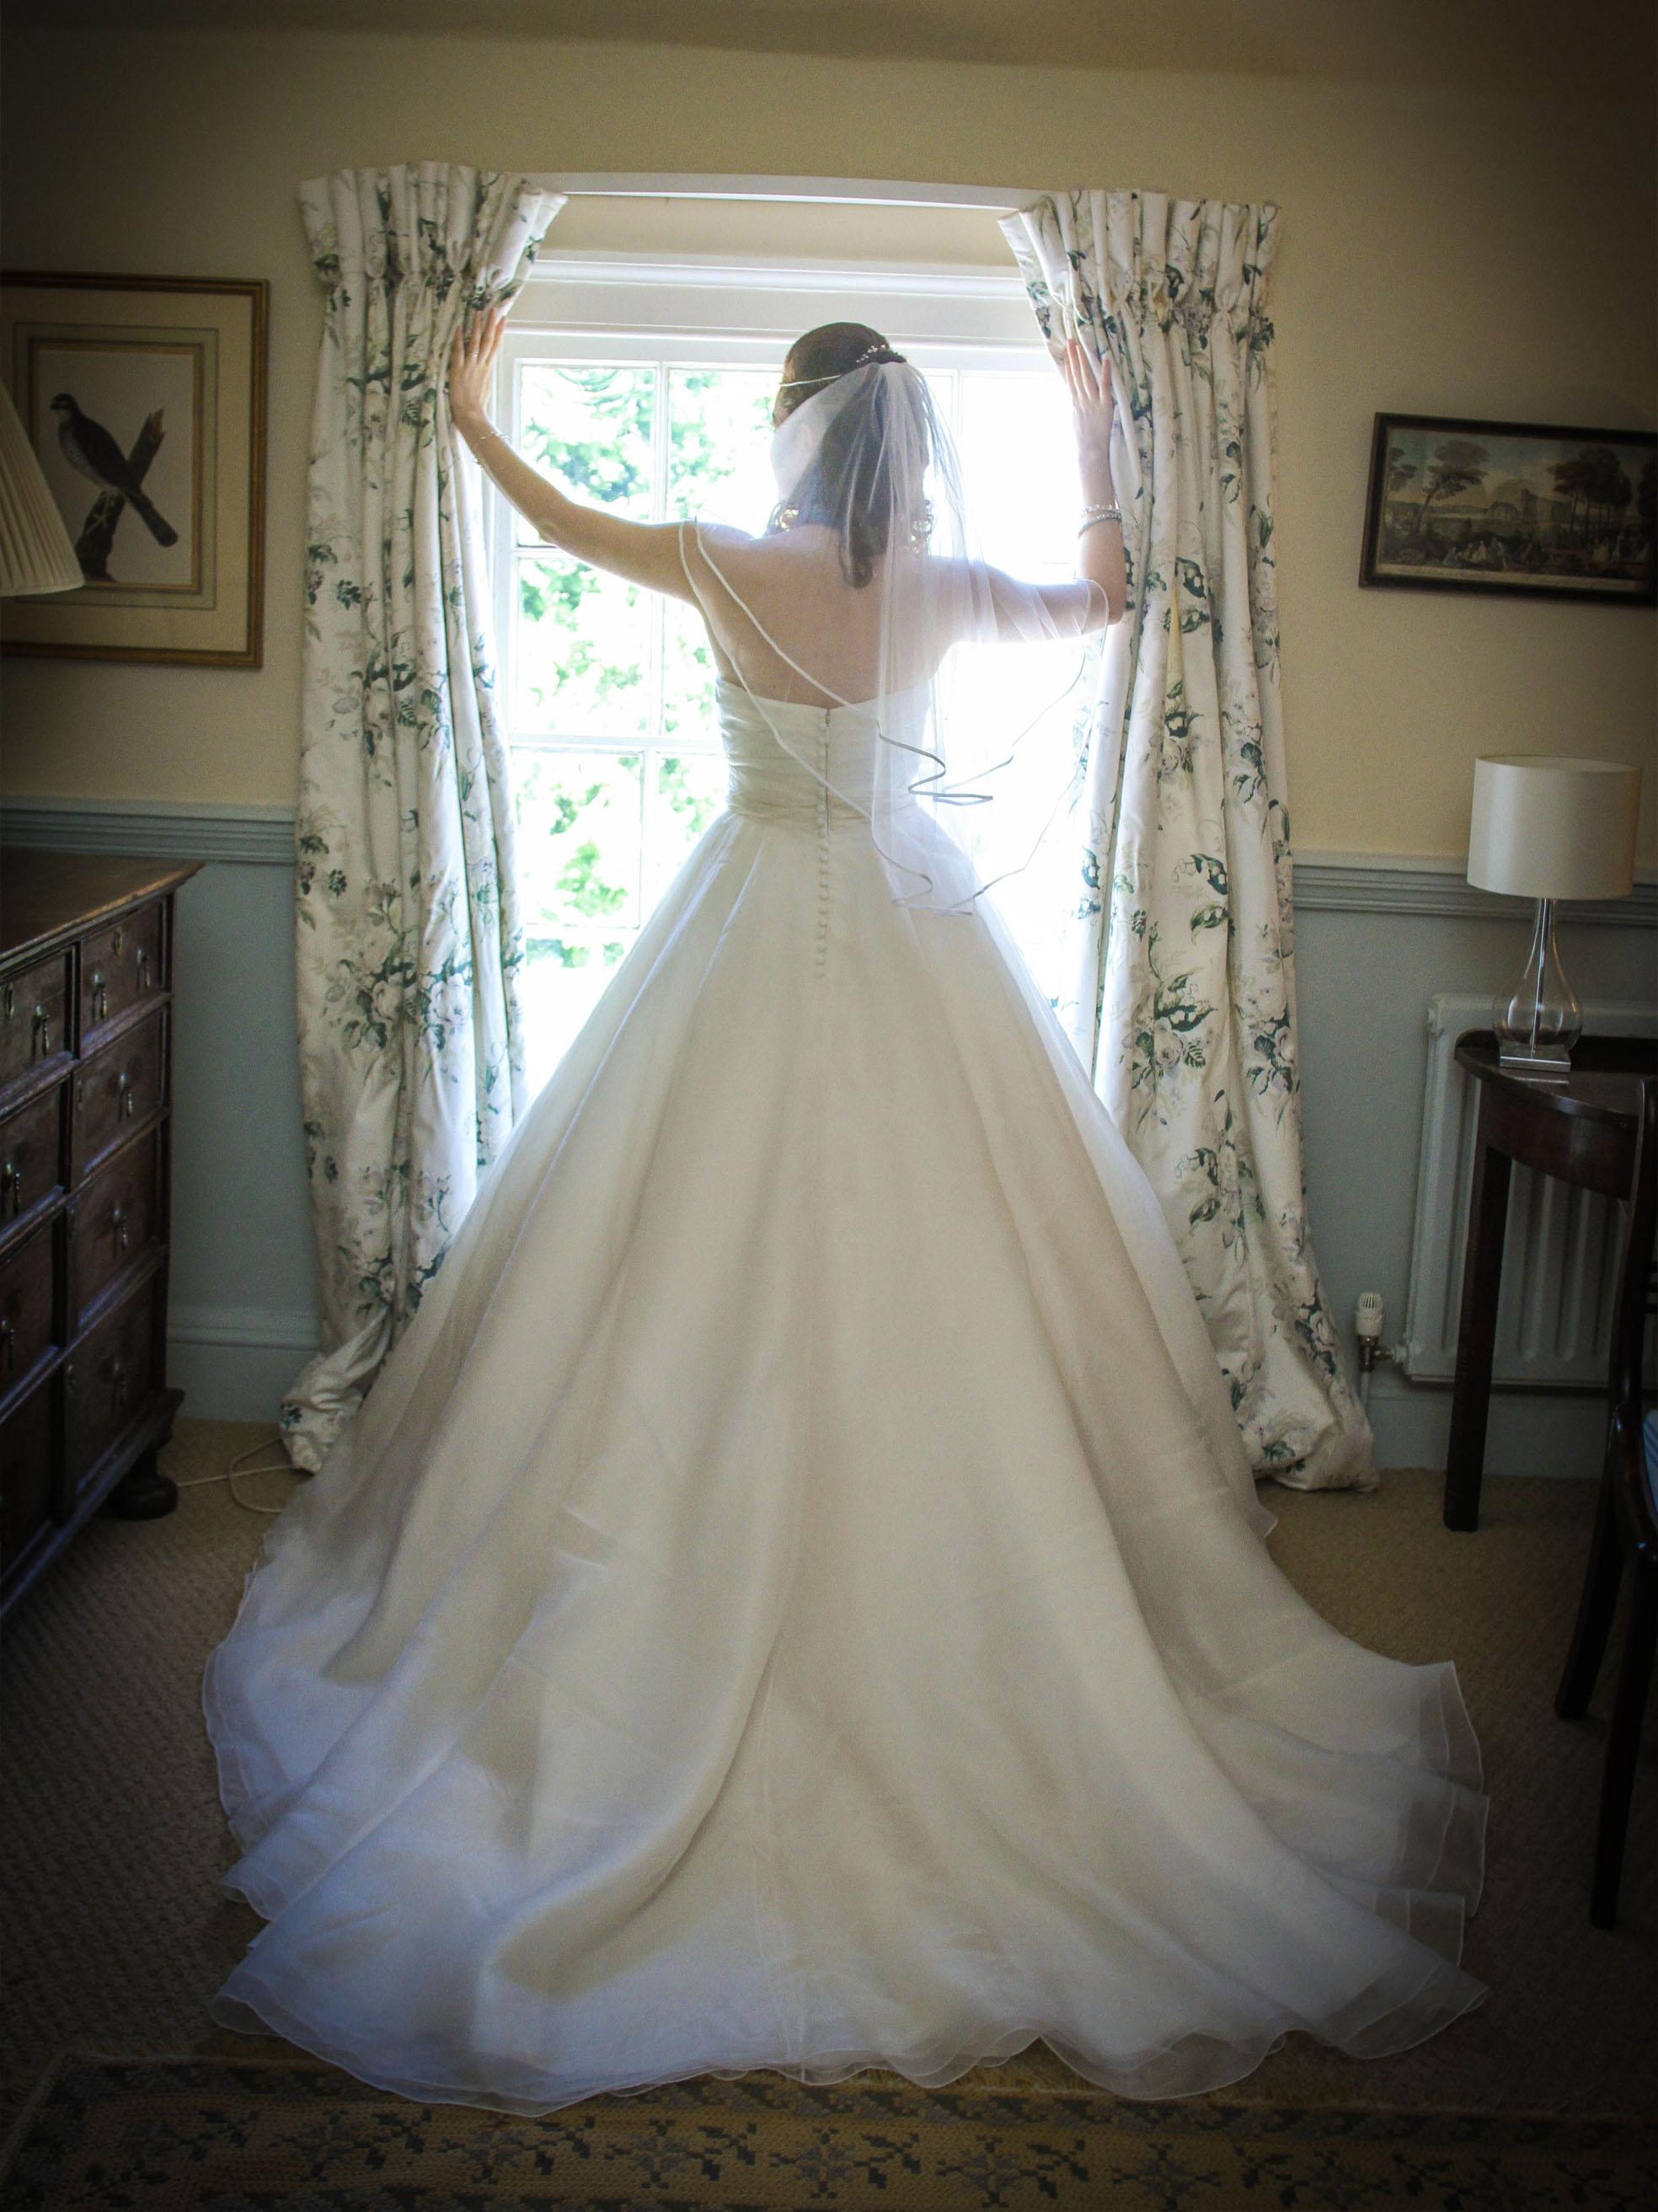 Combe Manor – Beautiful Wedding Venue in Combe, Berkshire